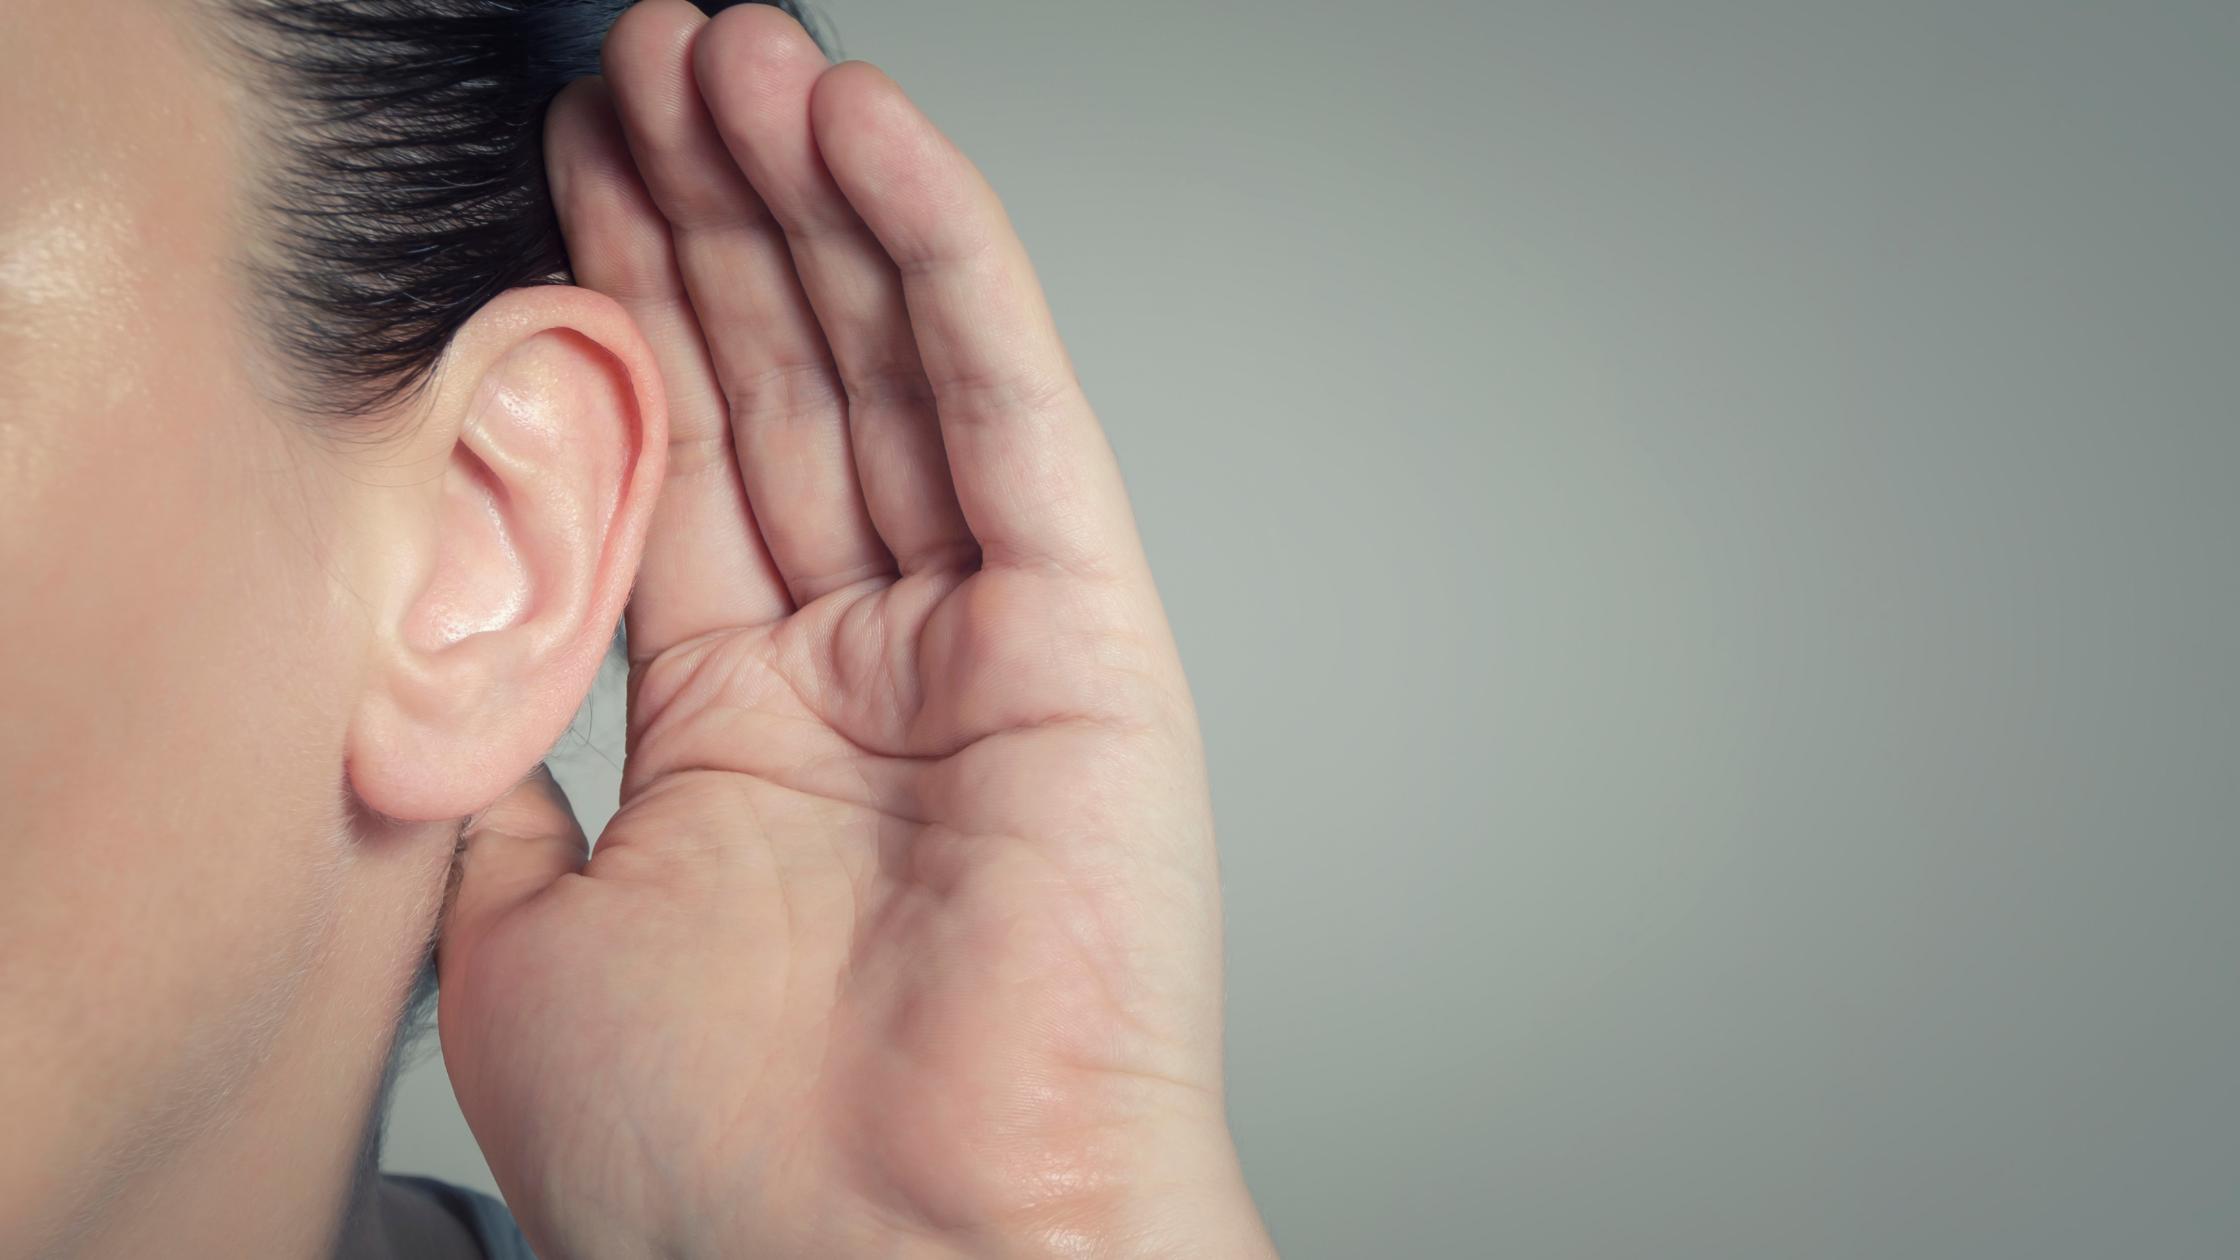 EFT for tinnitus